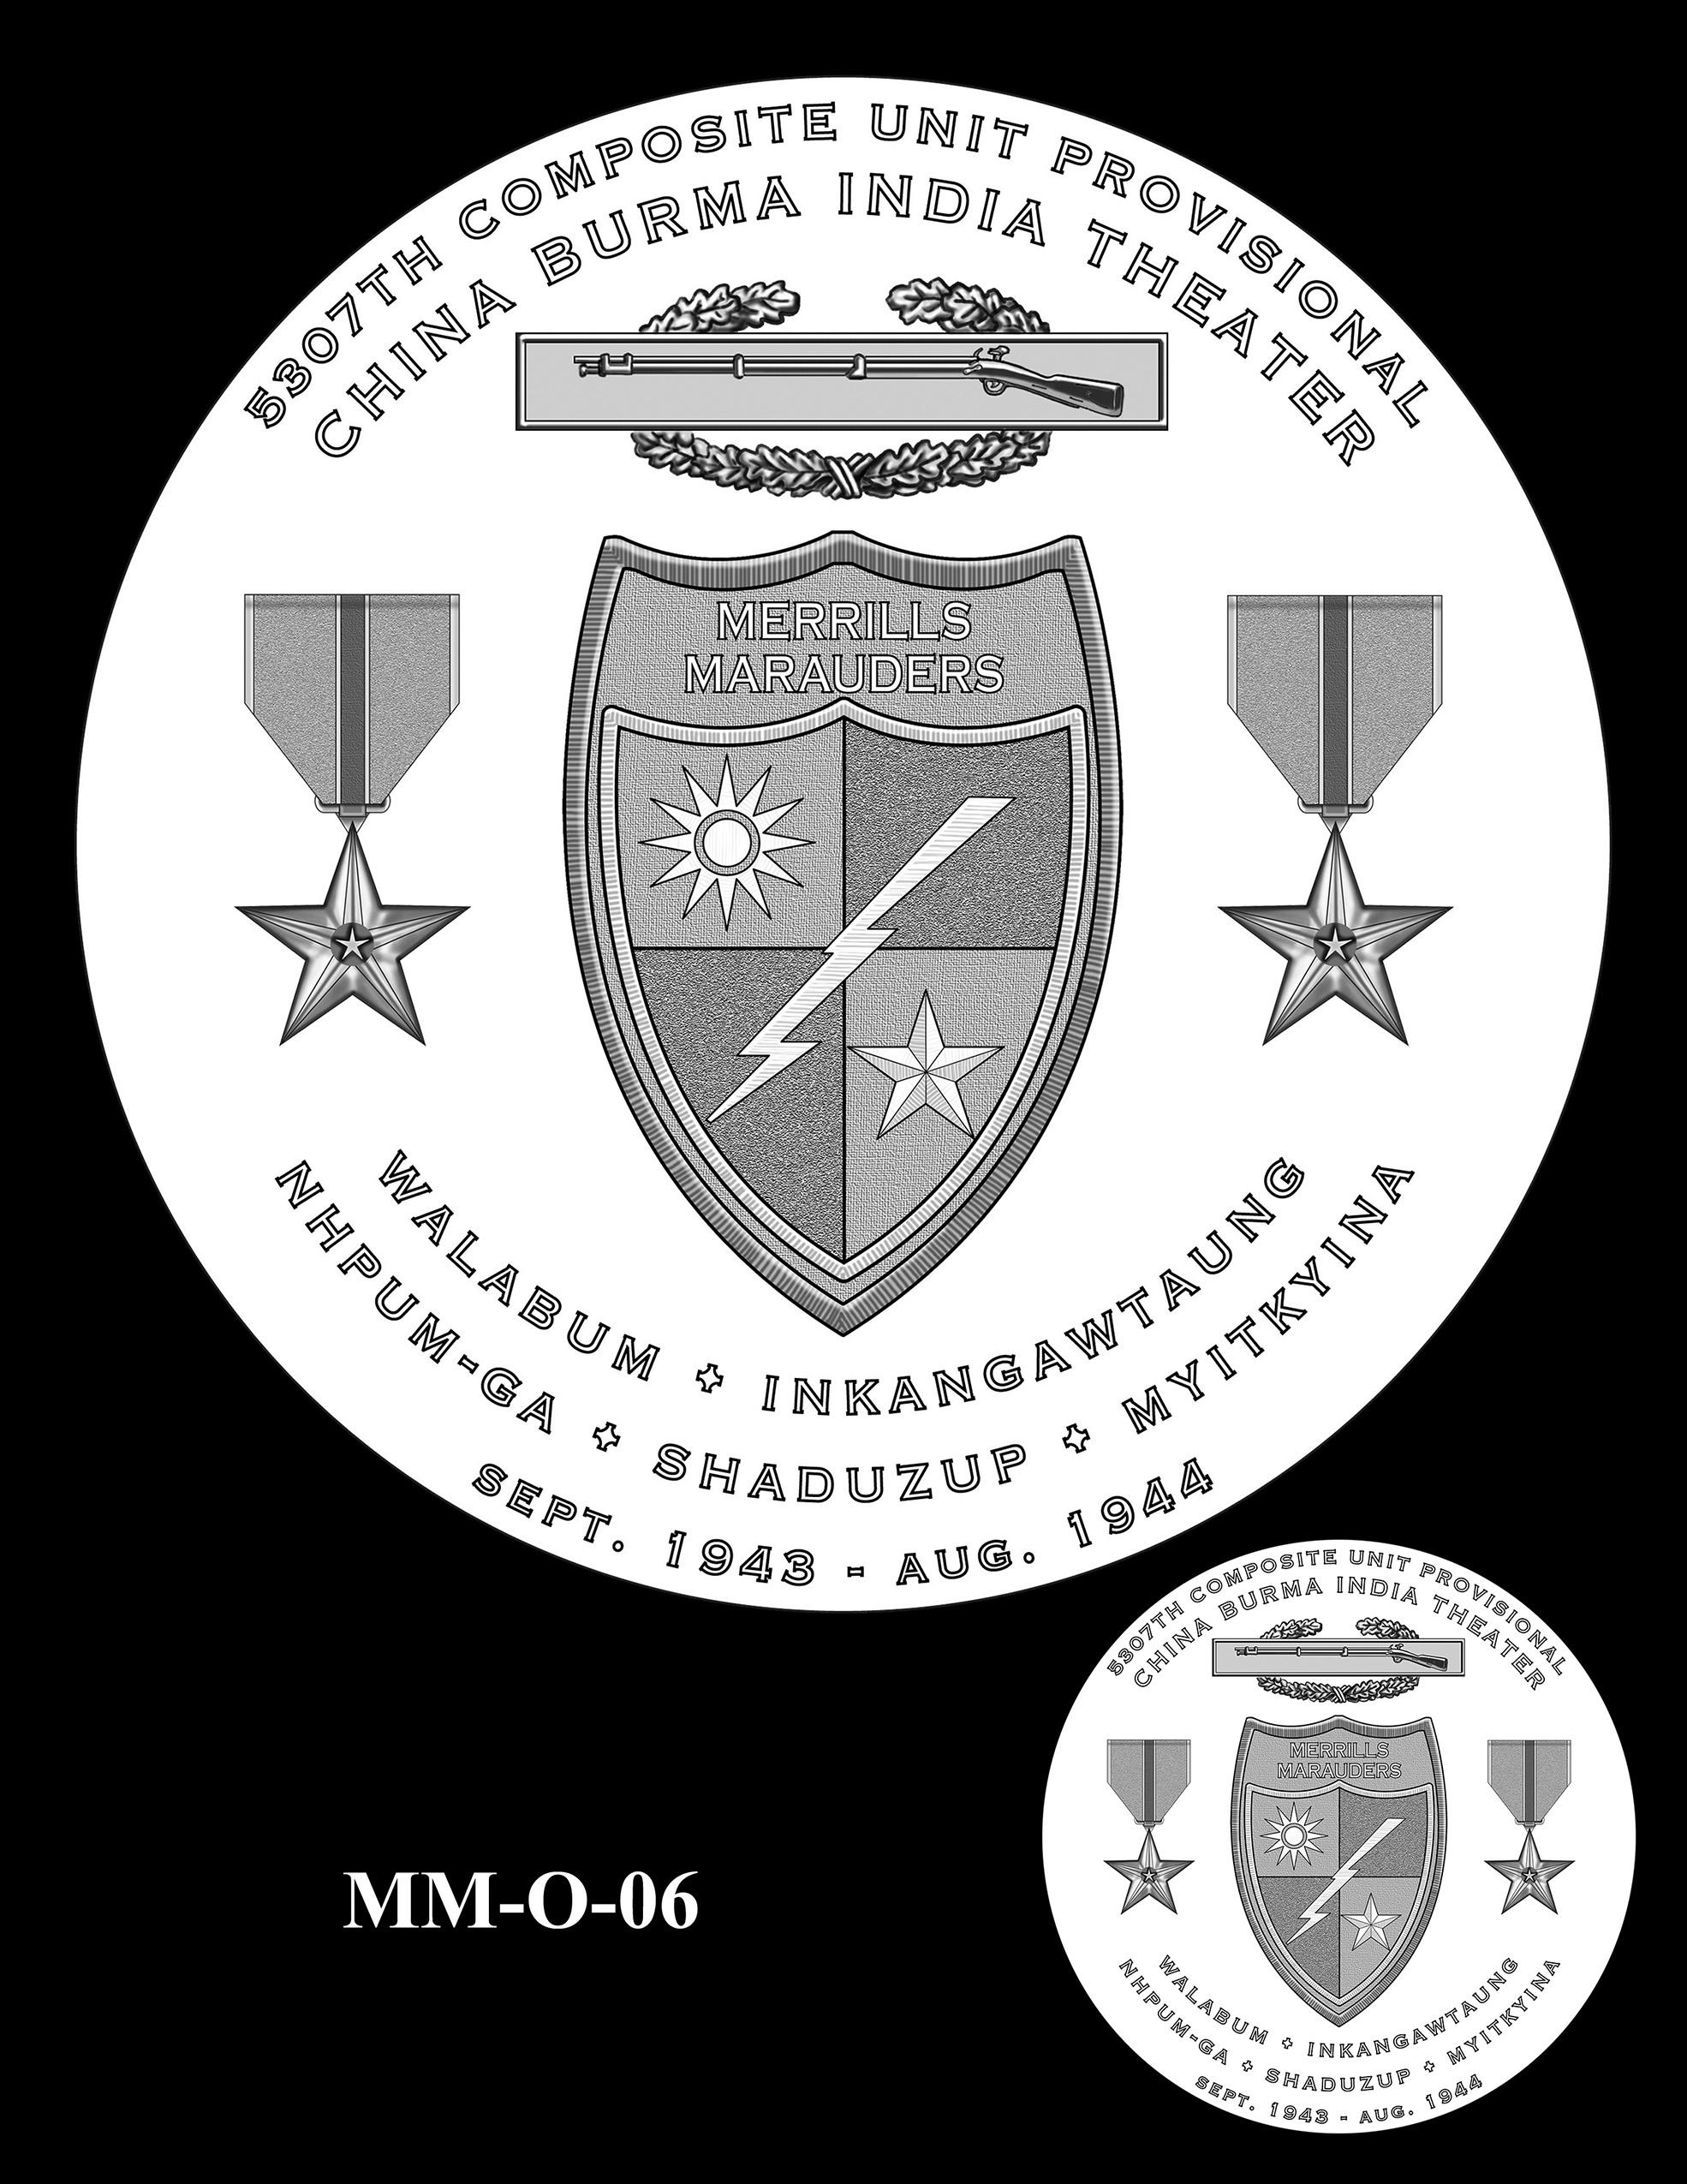 MM-O-06 -- Merrill's Marauders Congressional Gold Medal